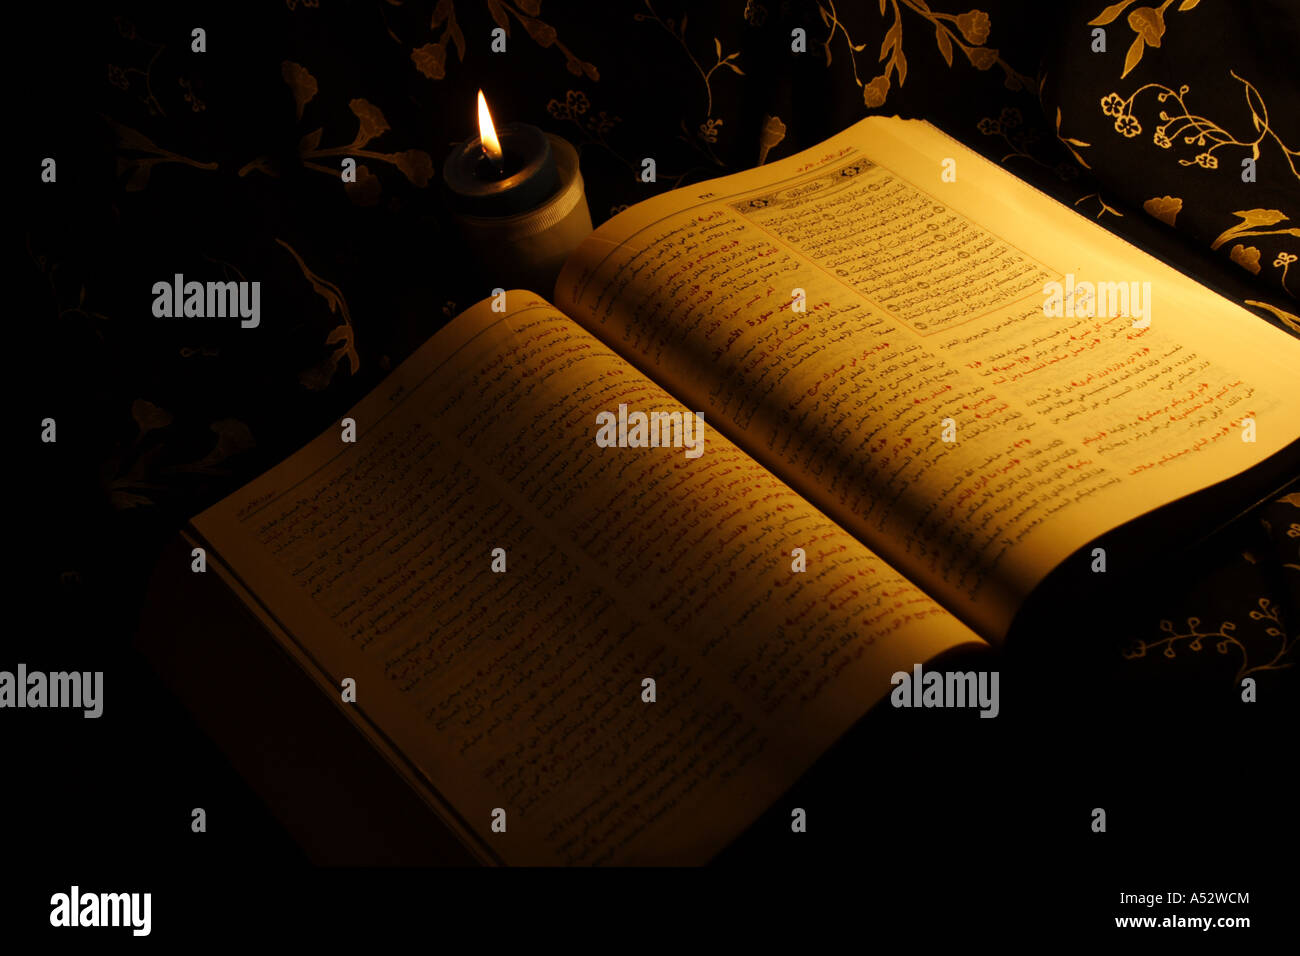 holy koran book - Stock Image